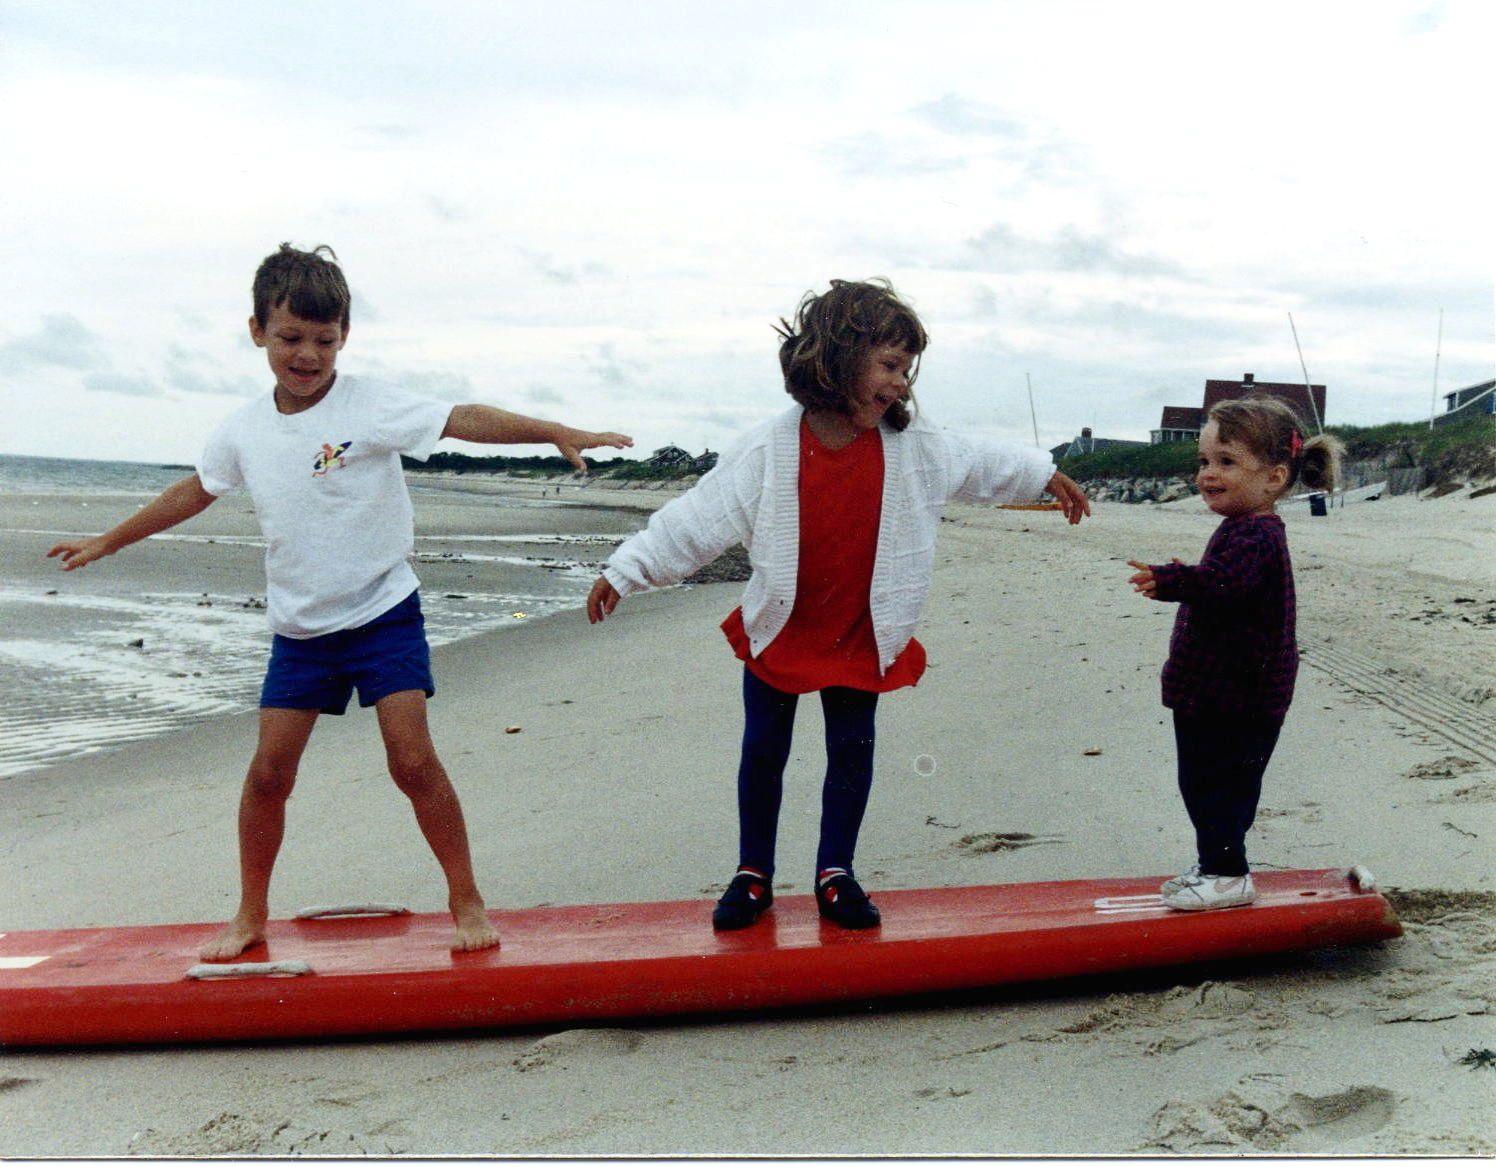 Kids on Corporation Beach, Dennis MA 1992 photo by Michele Nelson